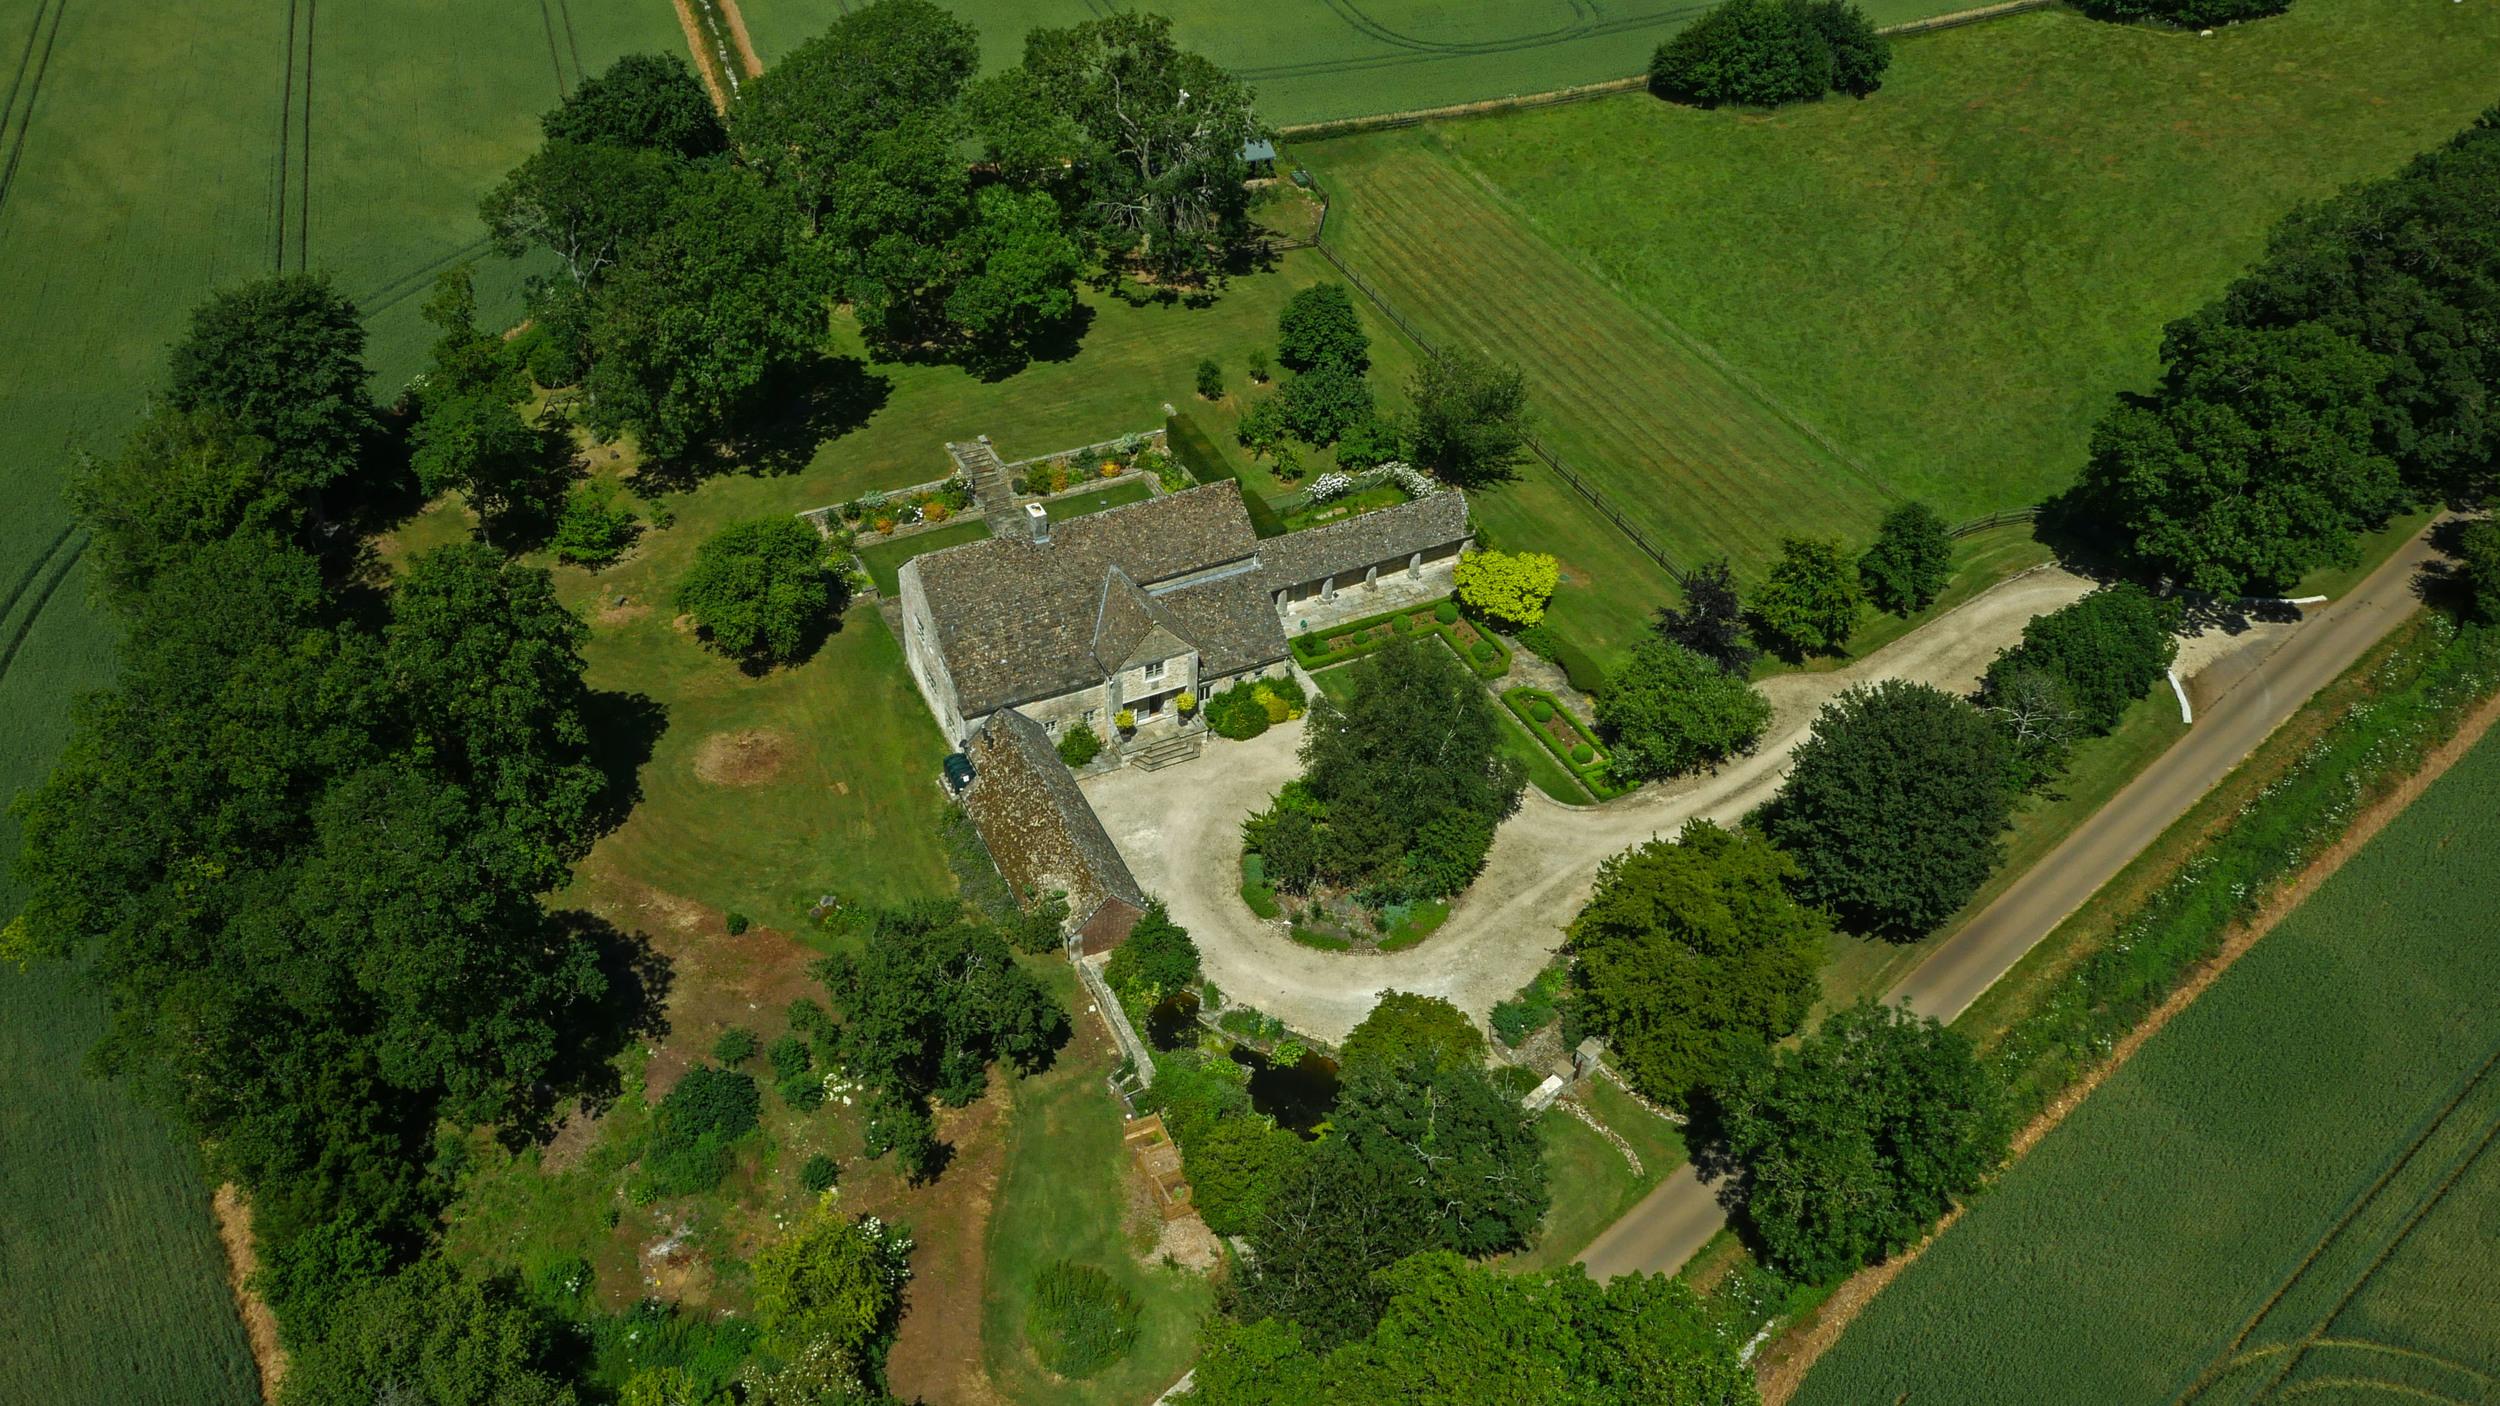 Property in Rodmarton